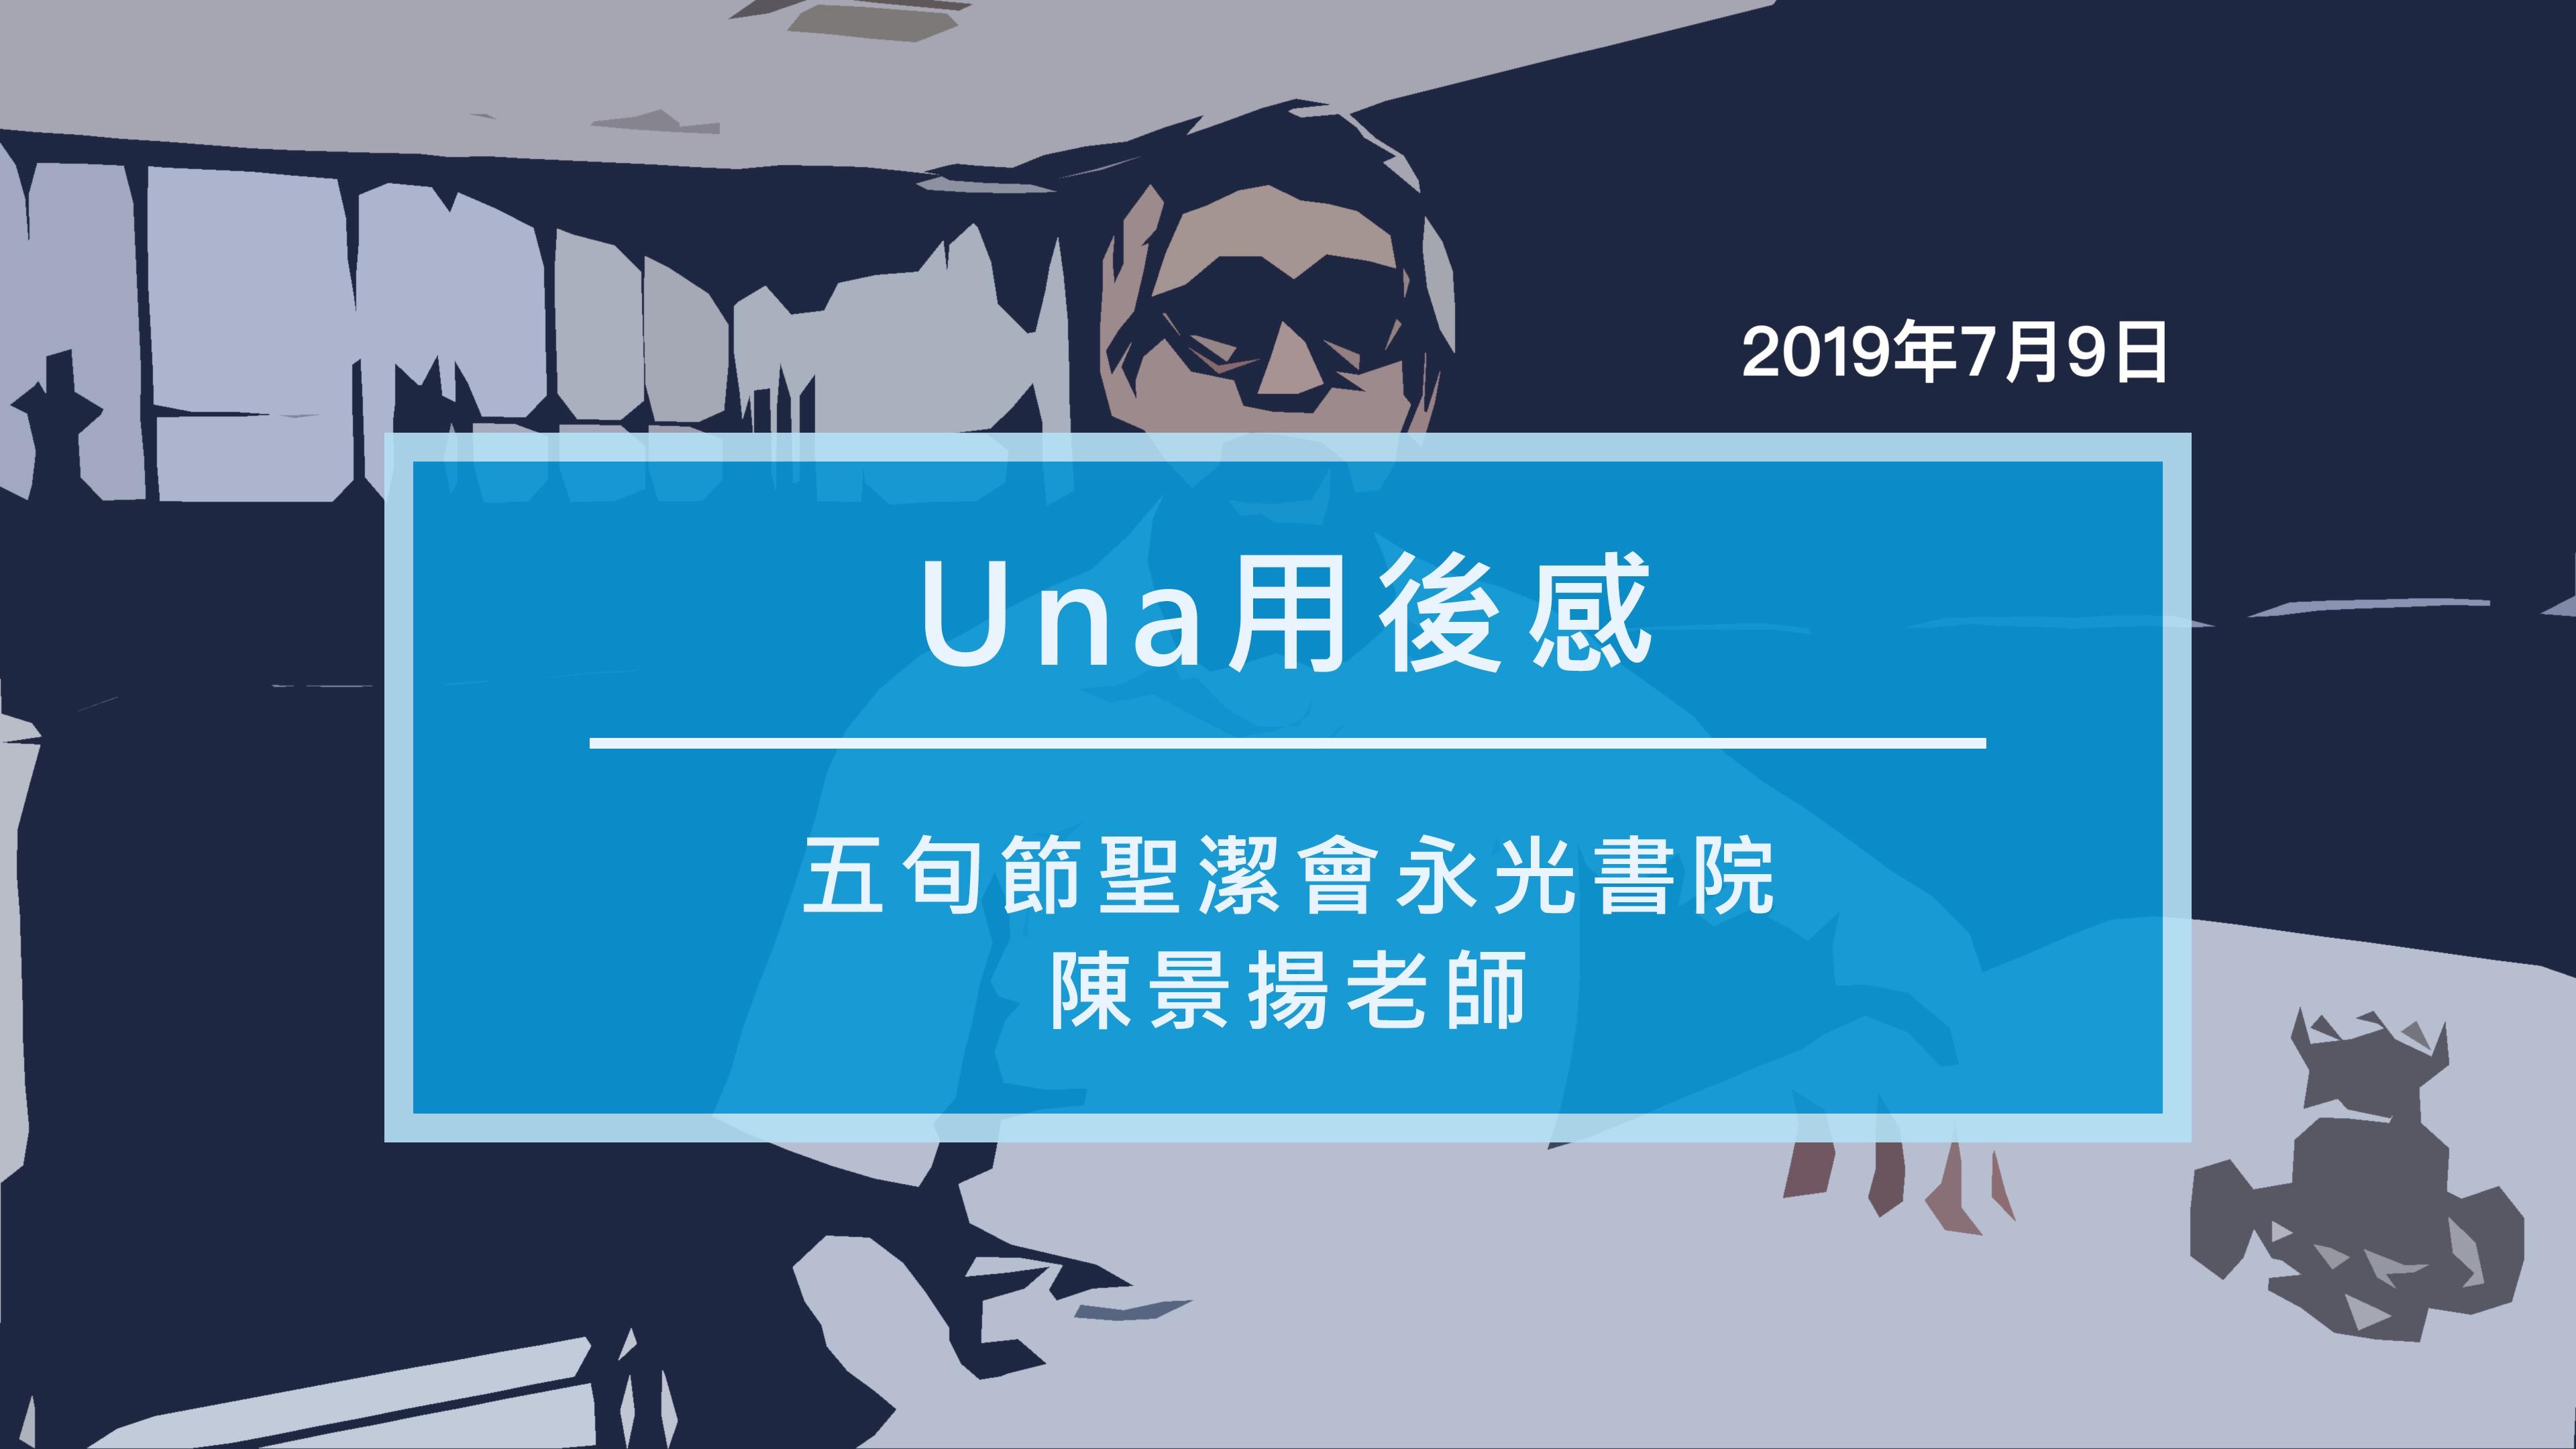 Una Teacher sharing on using Una Platform #7   P.H.C. Wing Kwong College